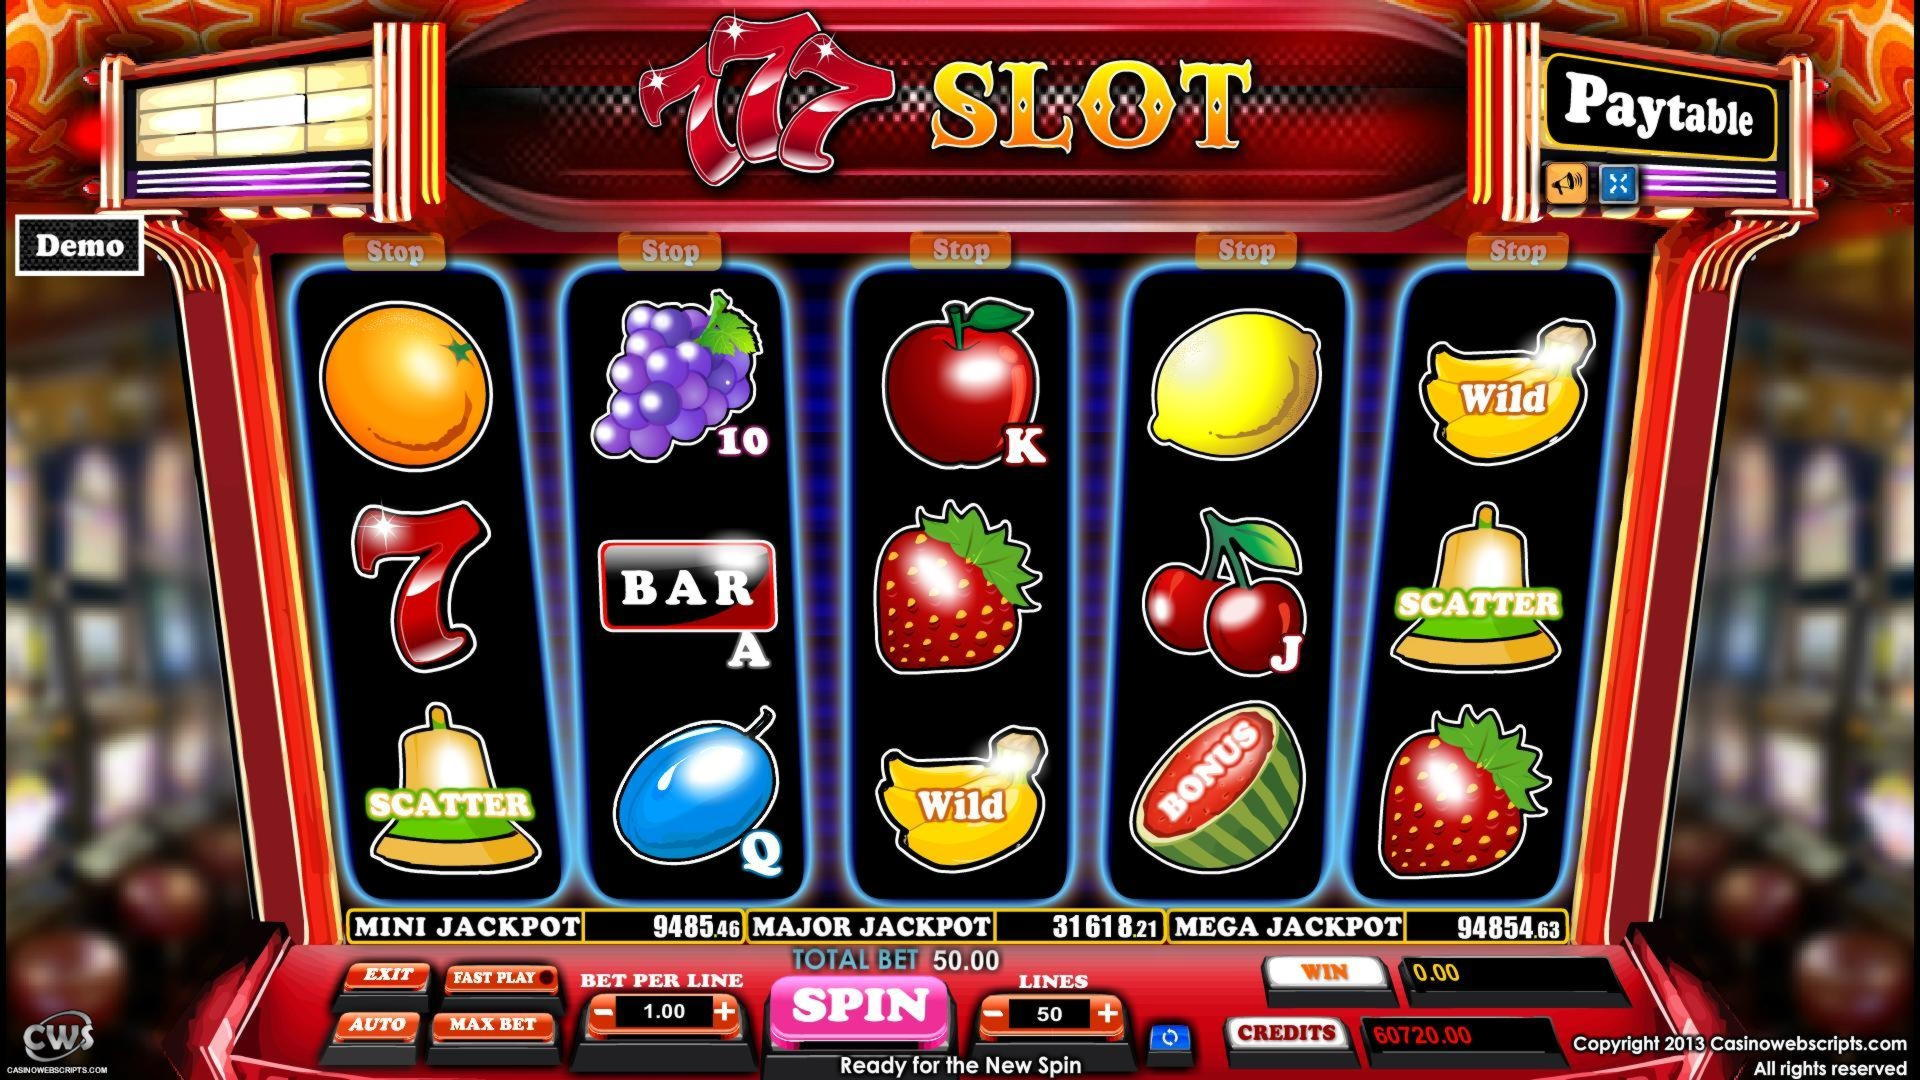 Tournoi 77 Casino à Fast Bet